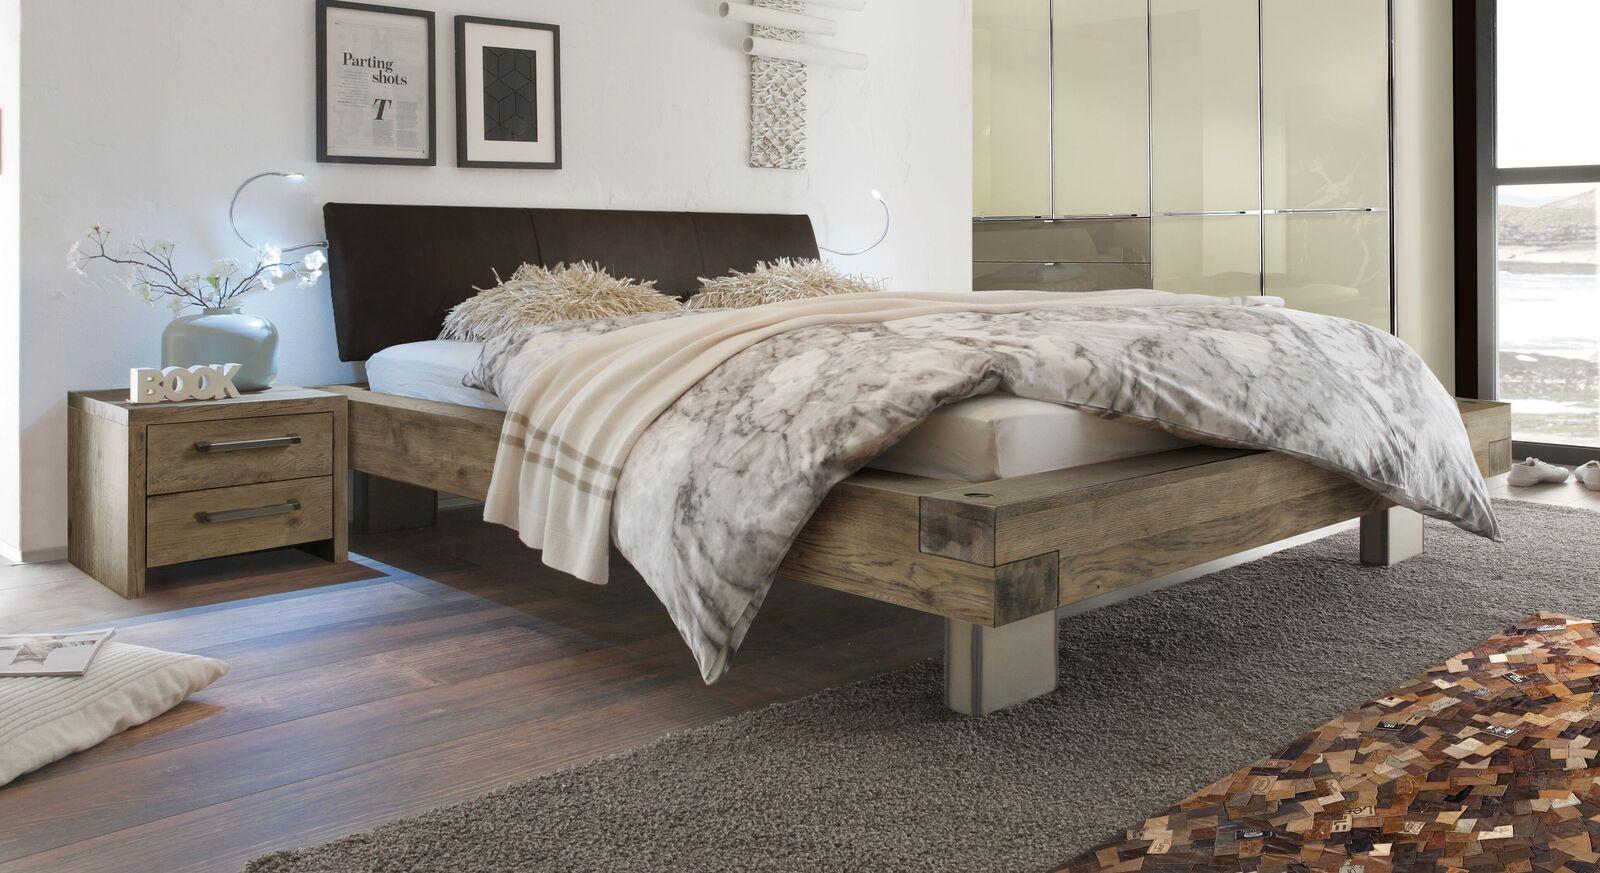 Holzbett Limeira in Terrabraun mit dunkelbraunem Luxus-Kunstleder